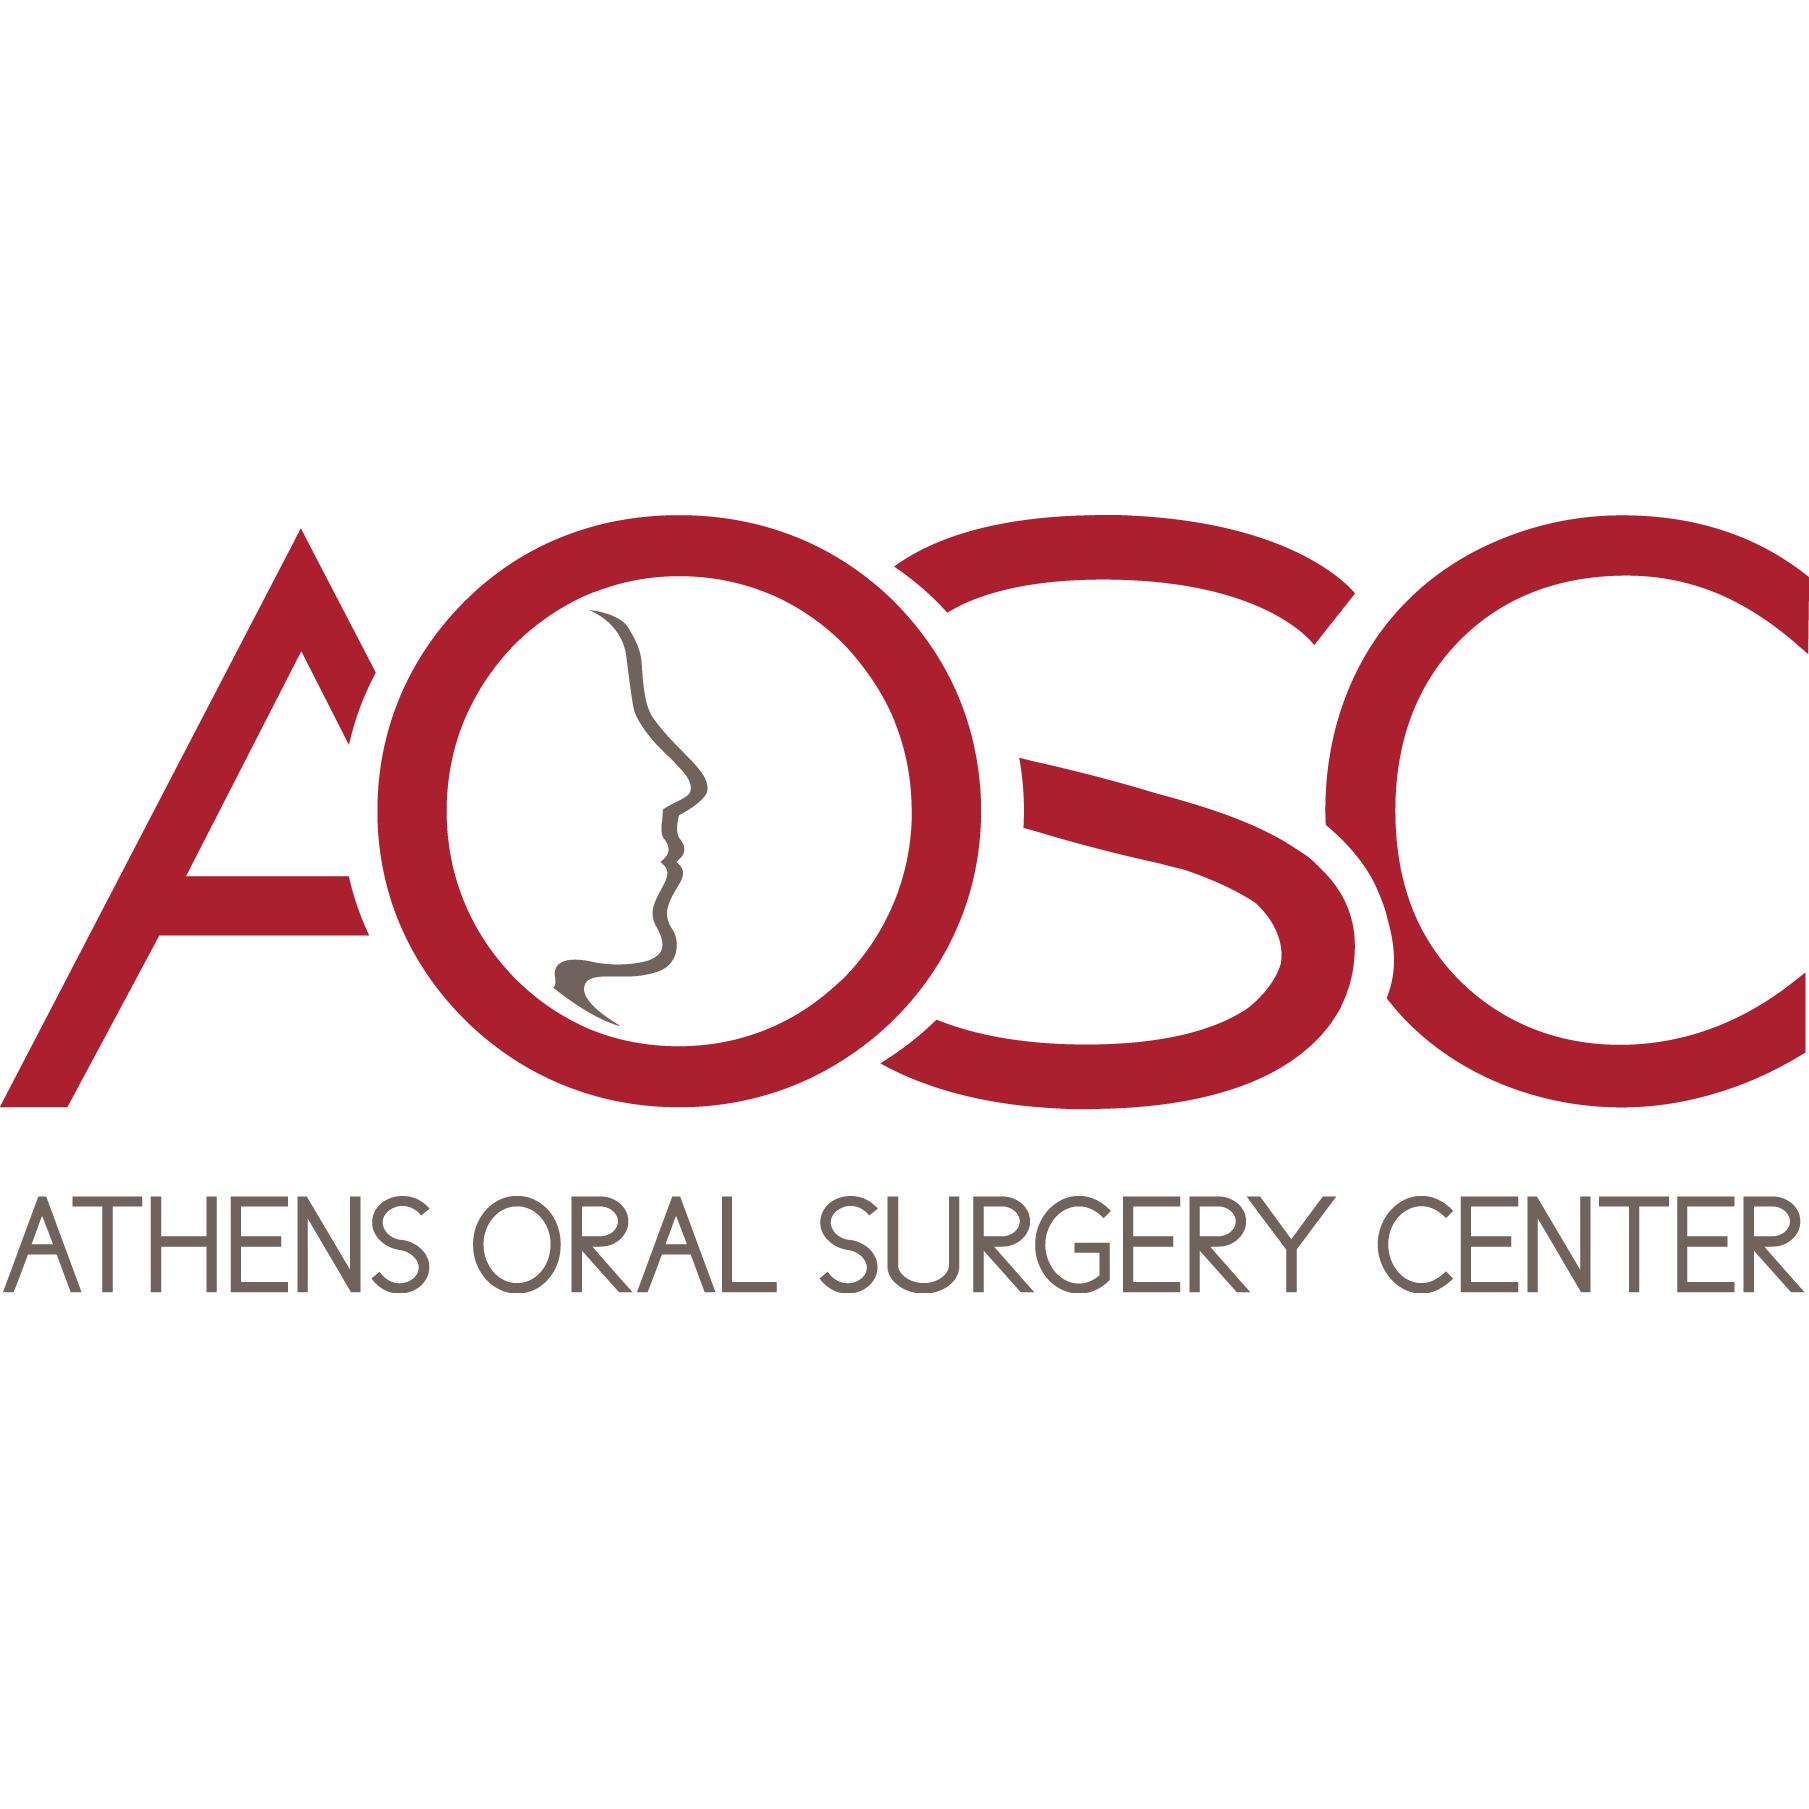 Athens Oral Surgery Center image 0